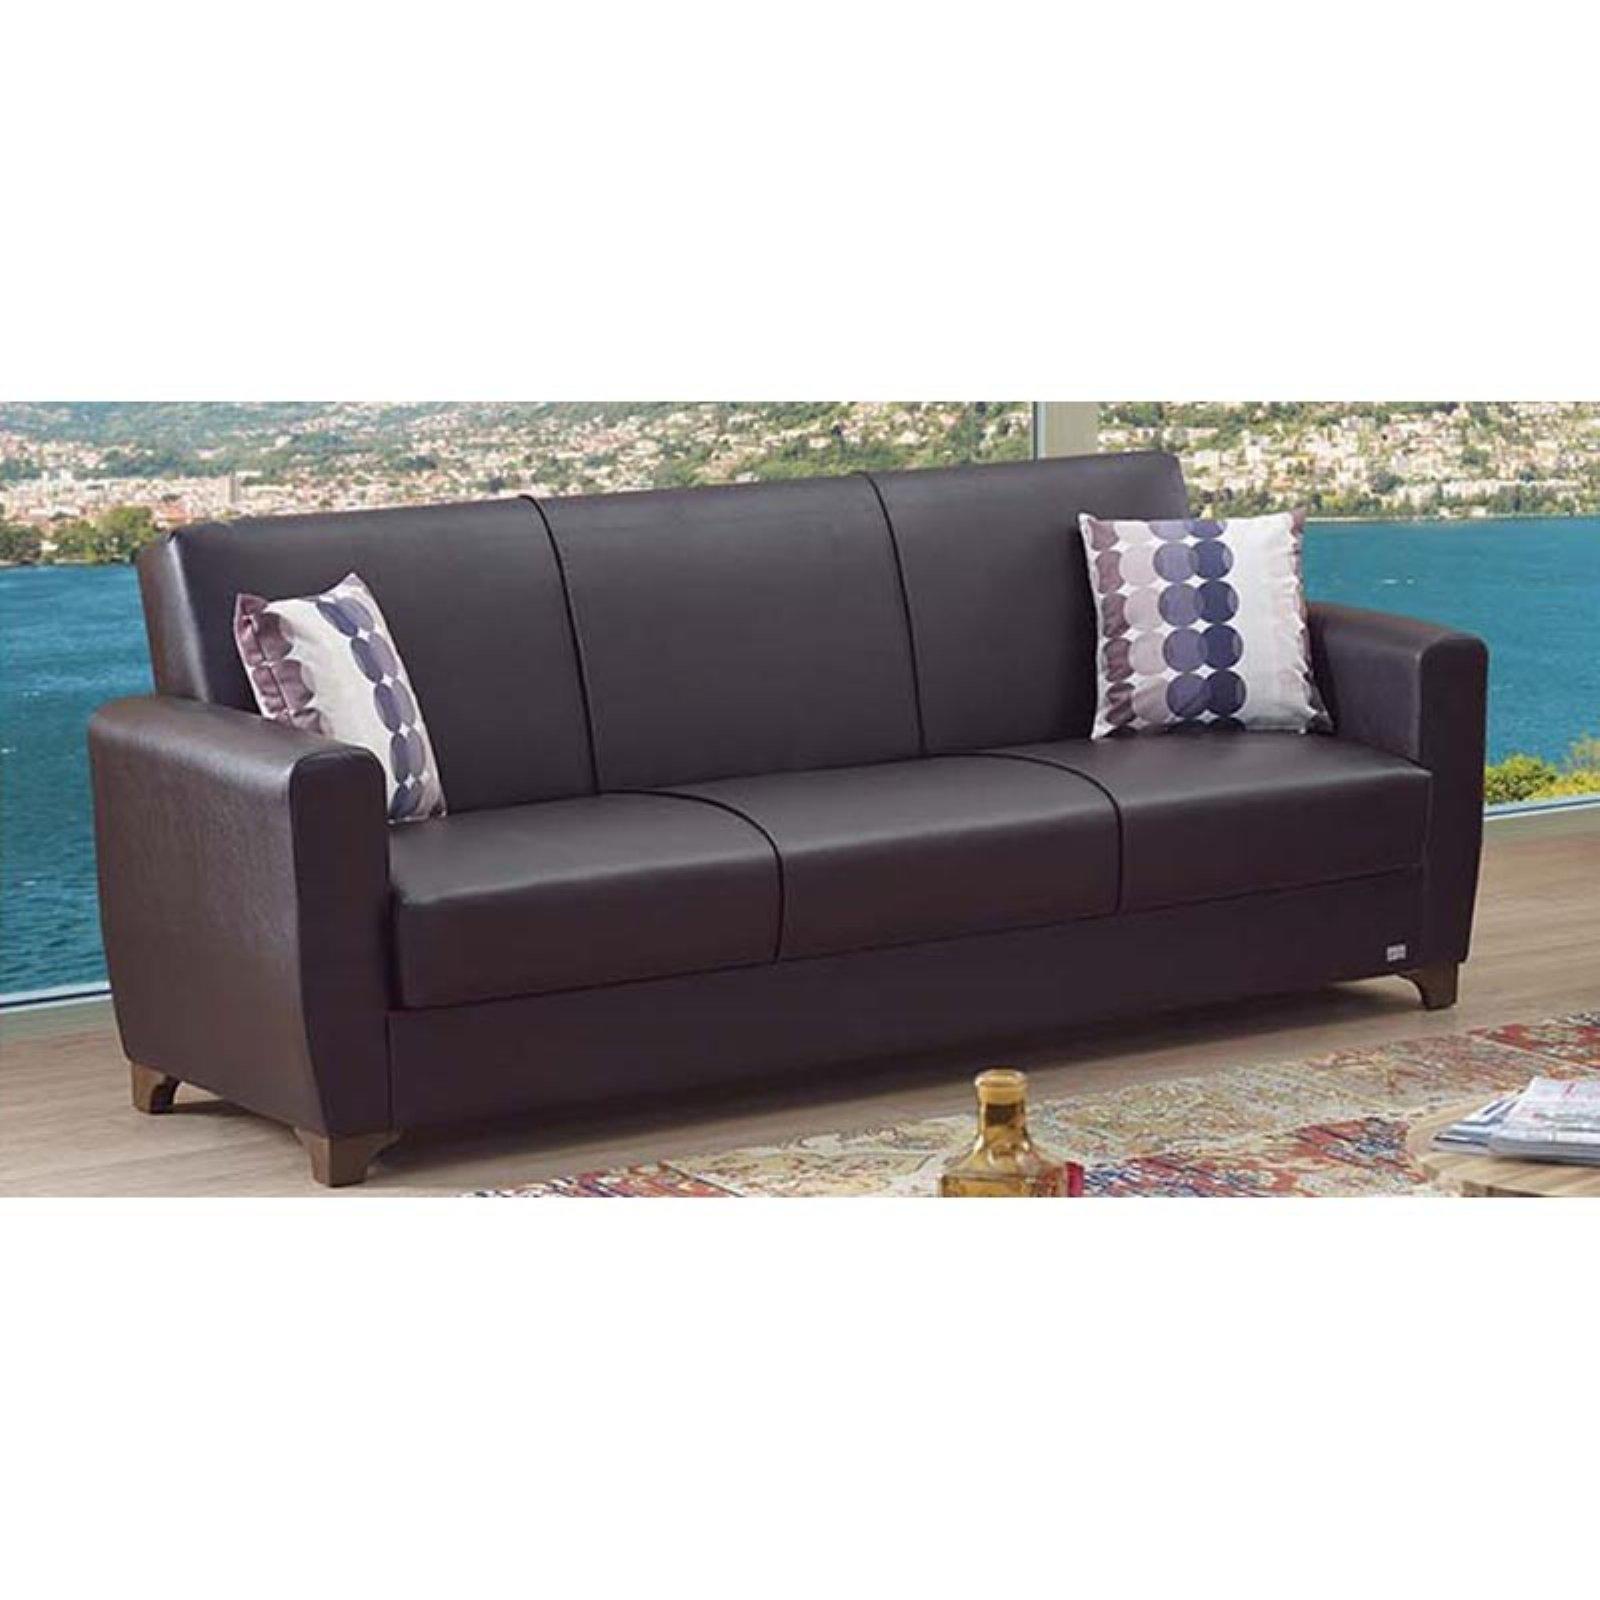 Empire Furniture USA Queens Convertible Sofa